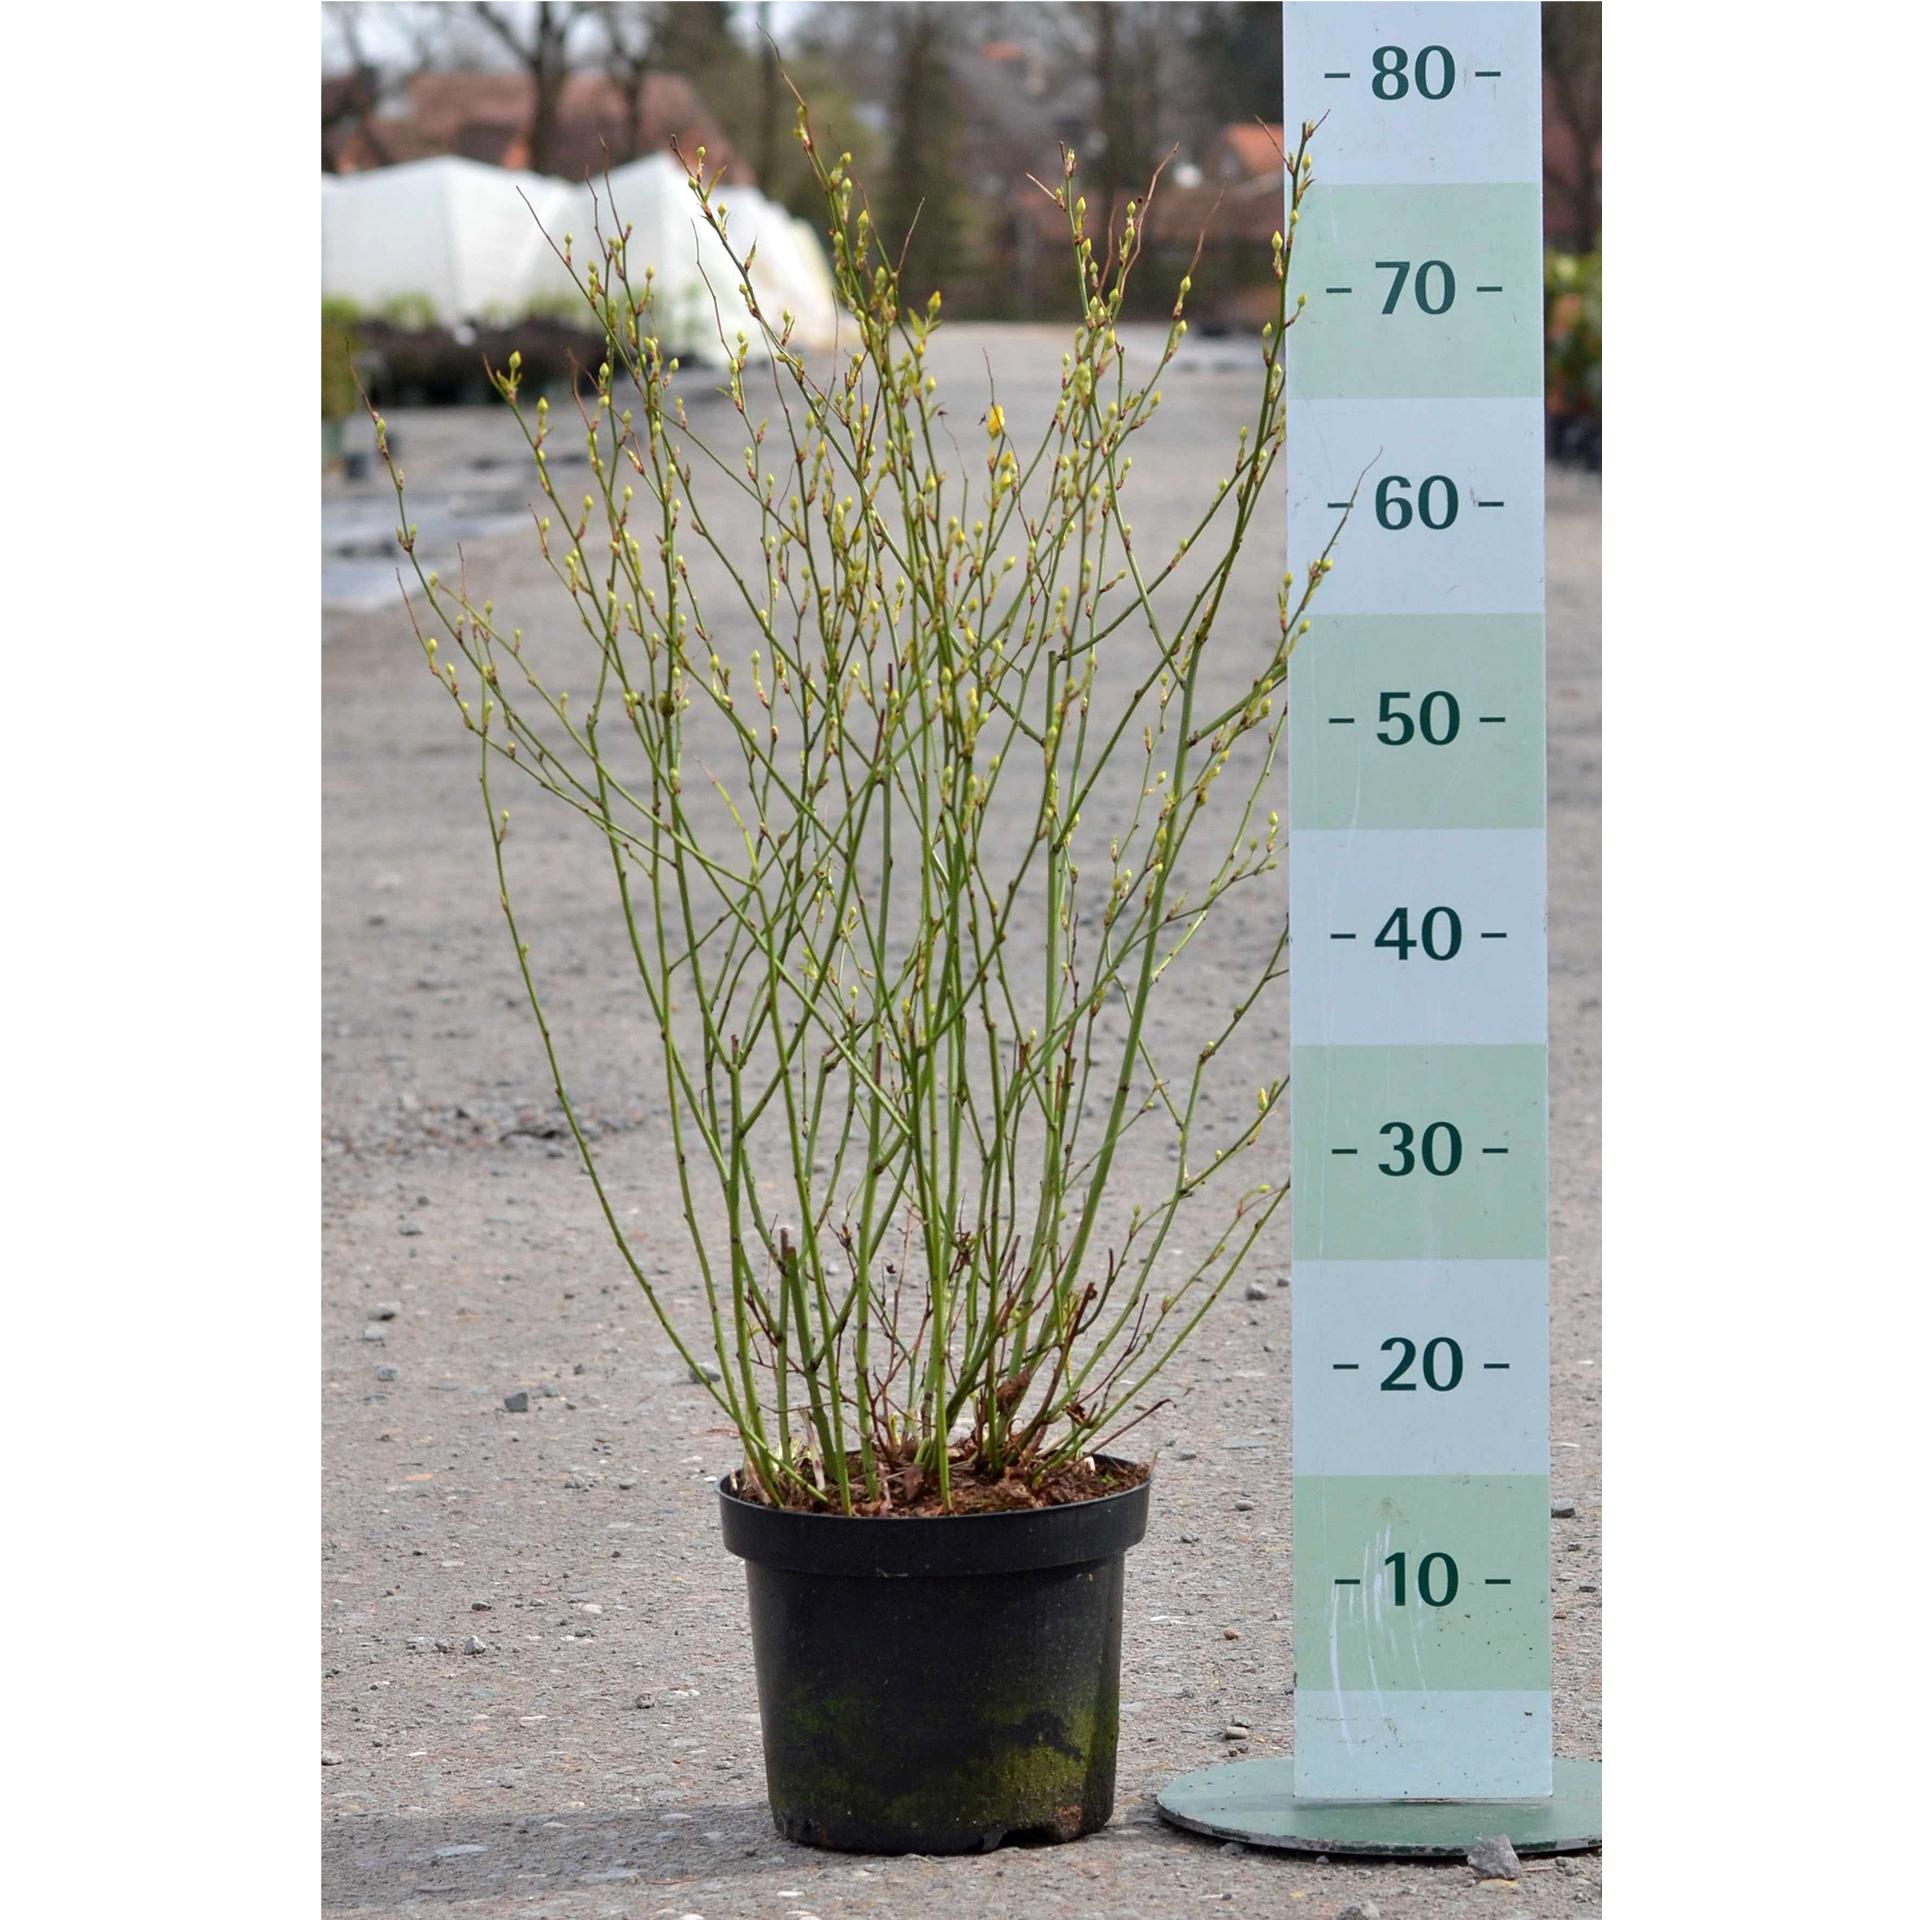 Ranunkelstrauch - Kerria japonica 'Golden Guinea', C4 50-60cm